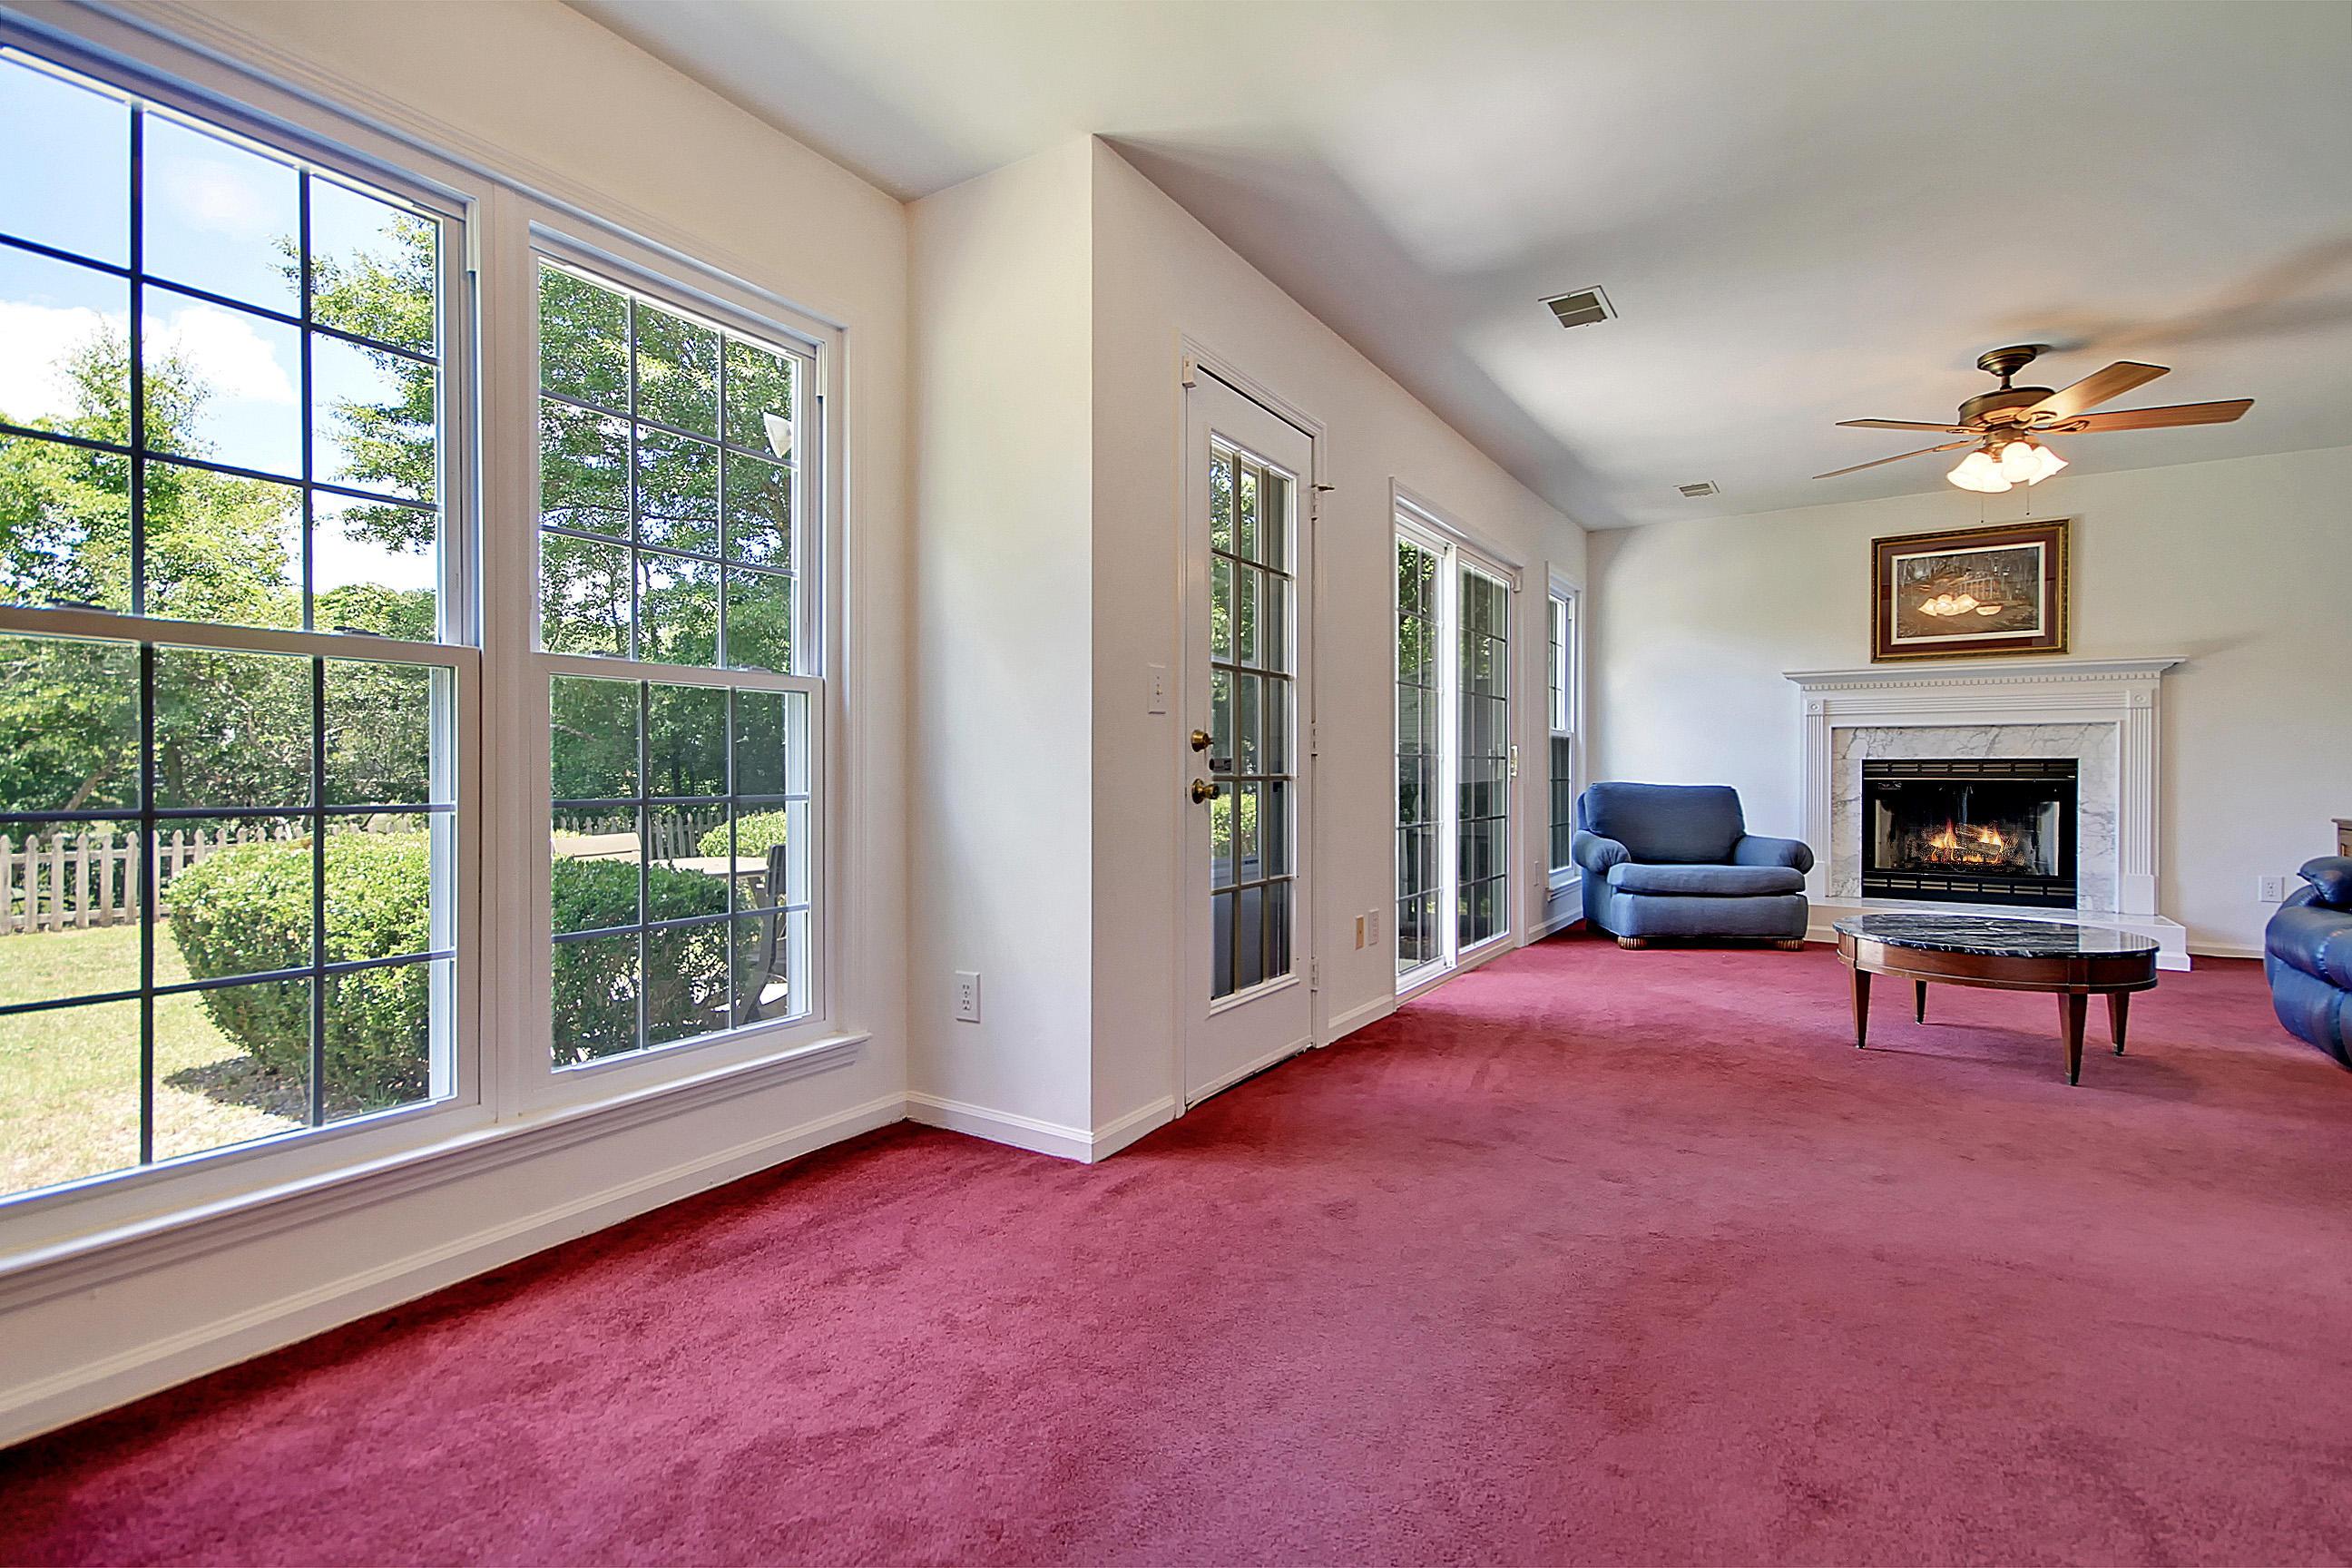 Center Lake Homes For Sale - 1252 Center Lake, Mount Pleasant, SC - 19